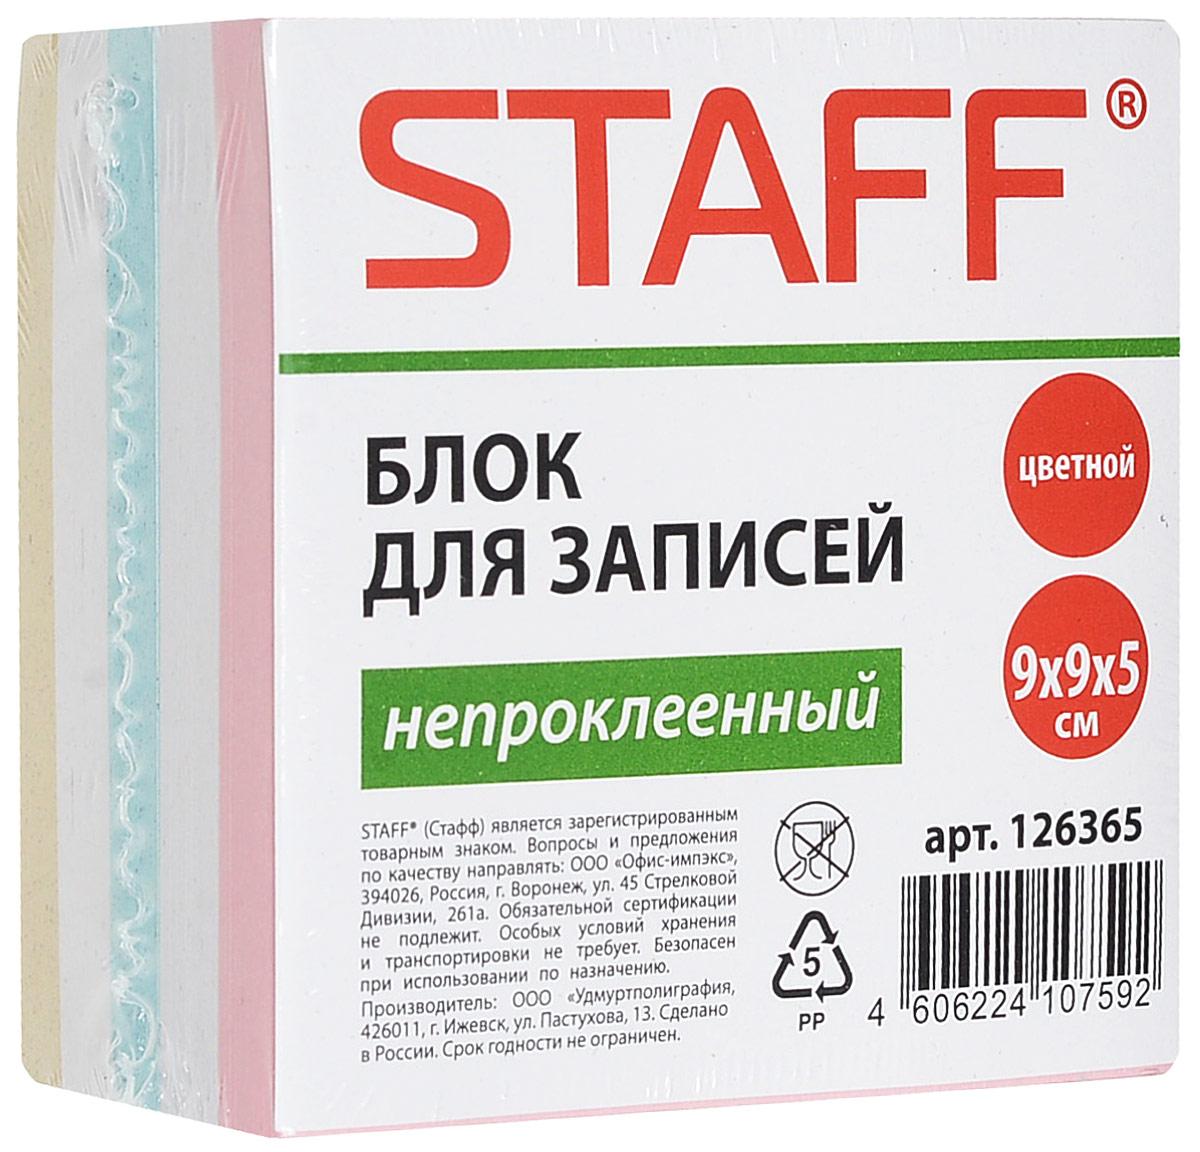 Staff Бумага для заметок 9 х 9 см 500 листов цвет мультиколор